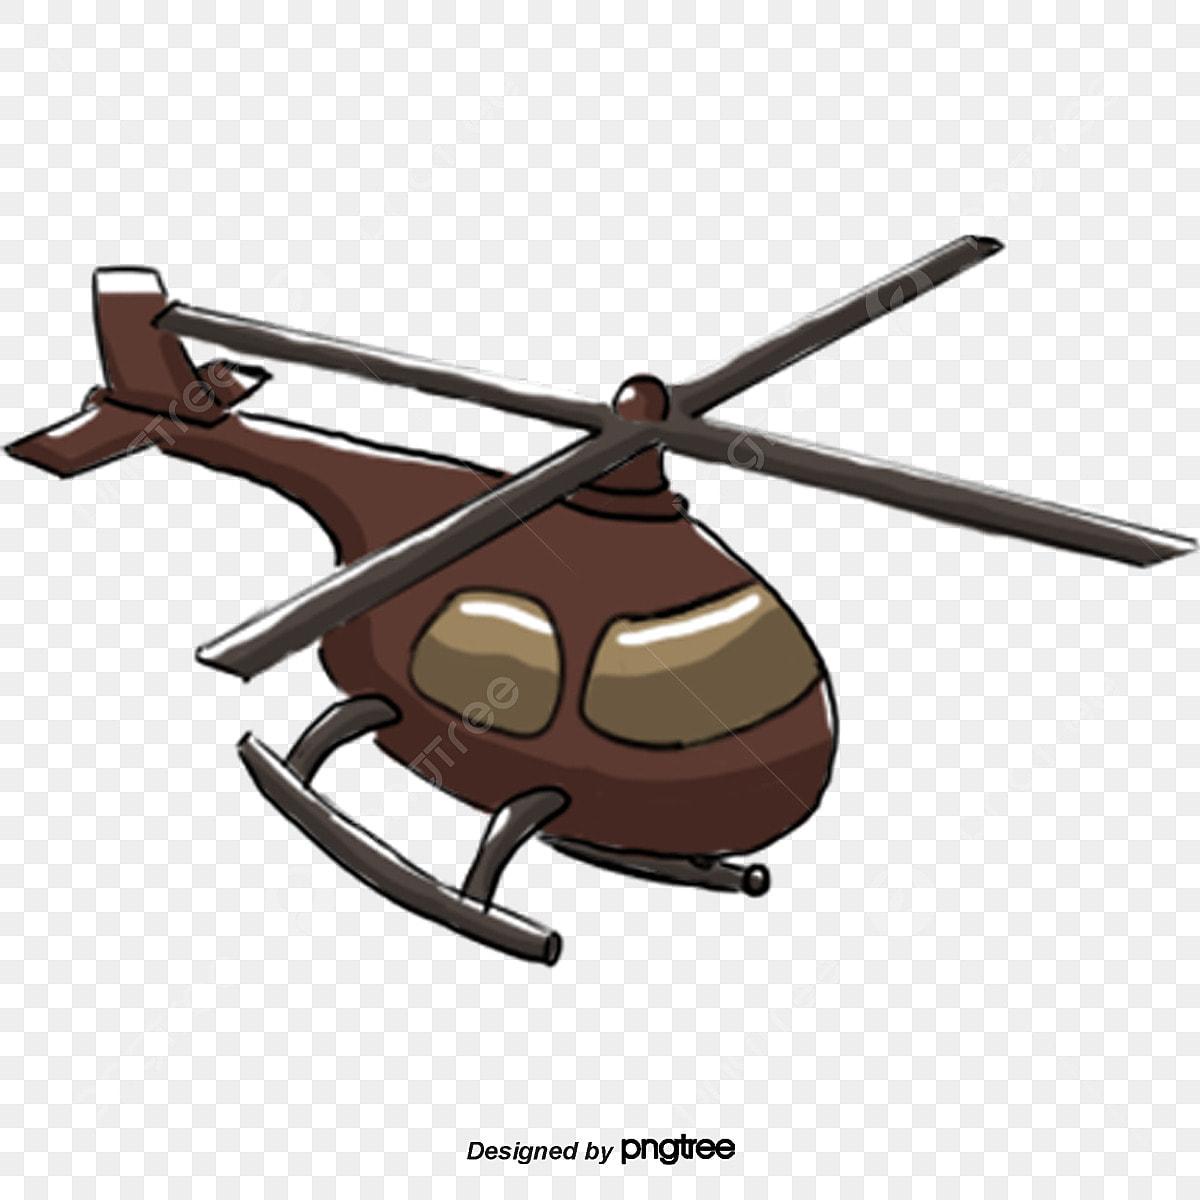 Kartun Coklat Helikopter Unsur Unsur Kartun Tempat